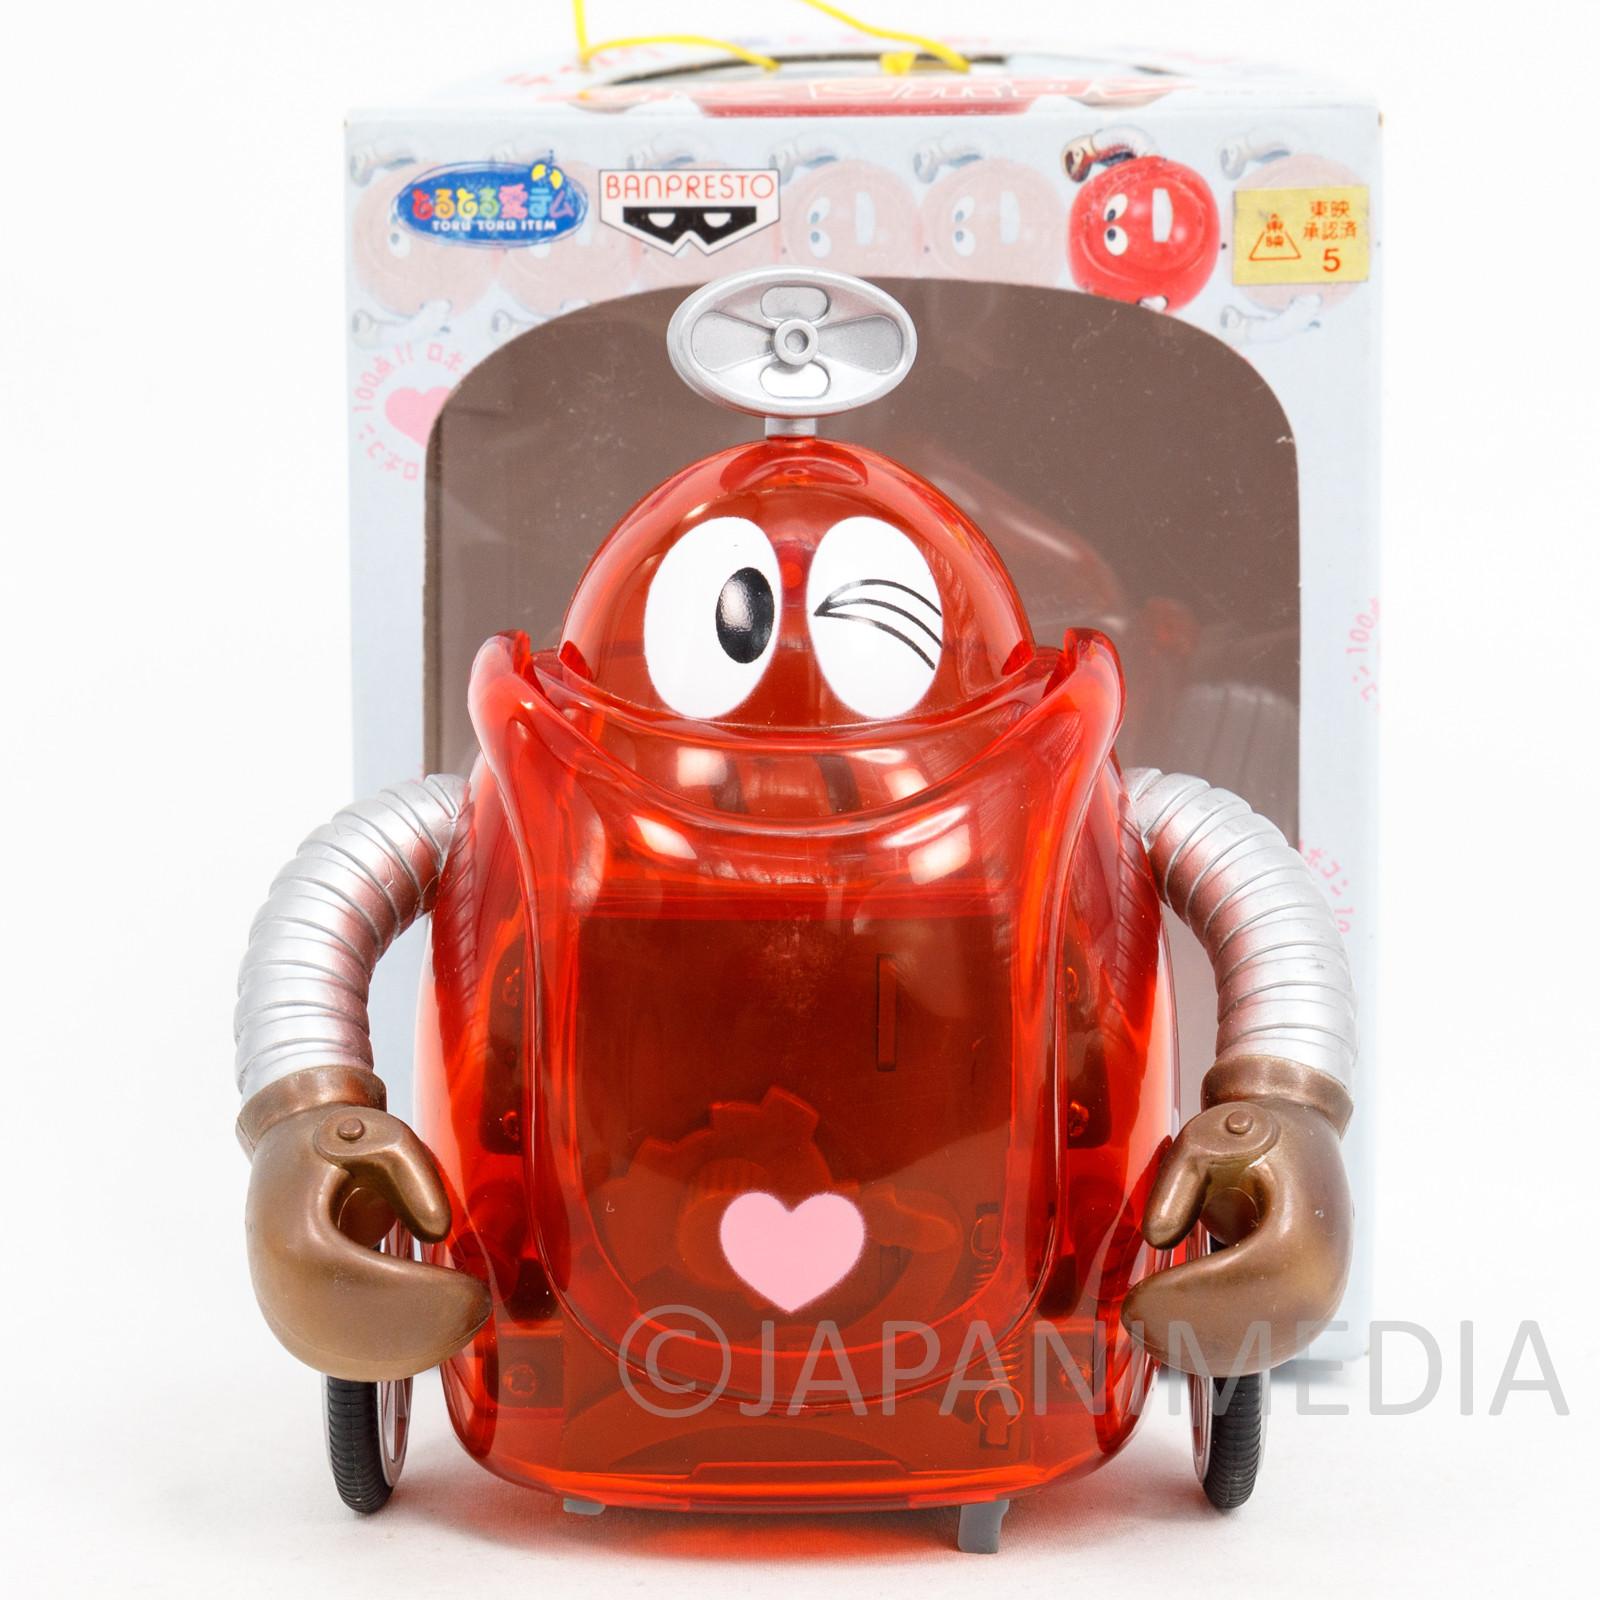 Robocon Figure Battery operated Moving Toy Banpresto JAPAN ANIME TOKUSATSU